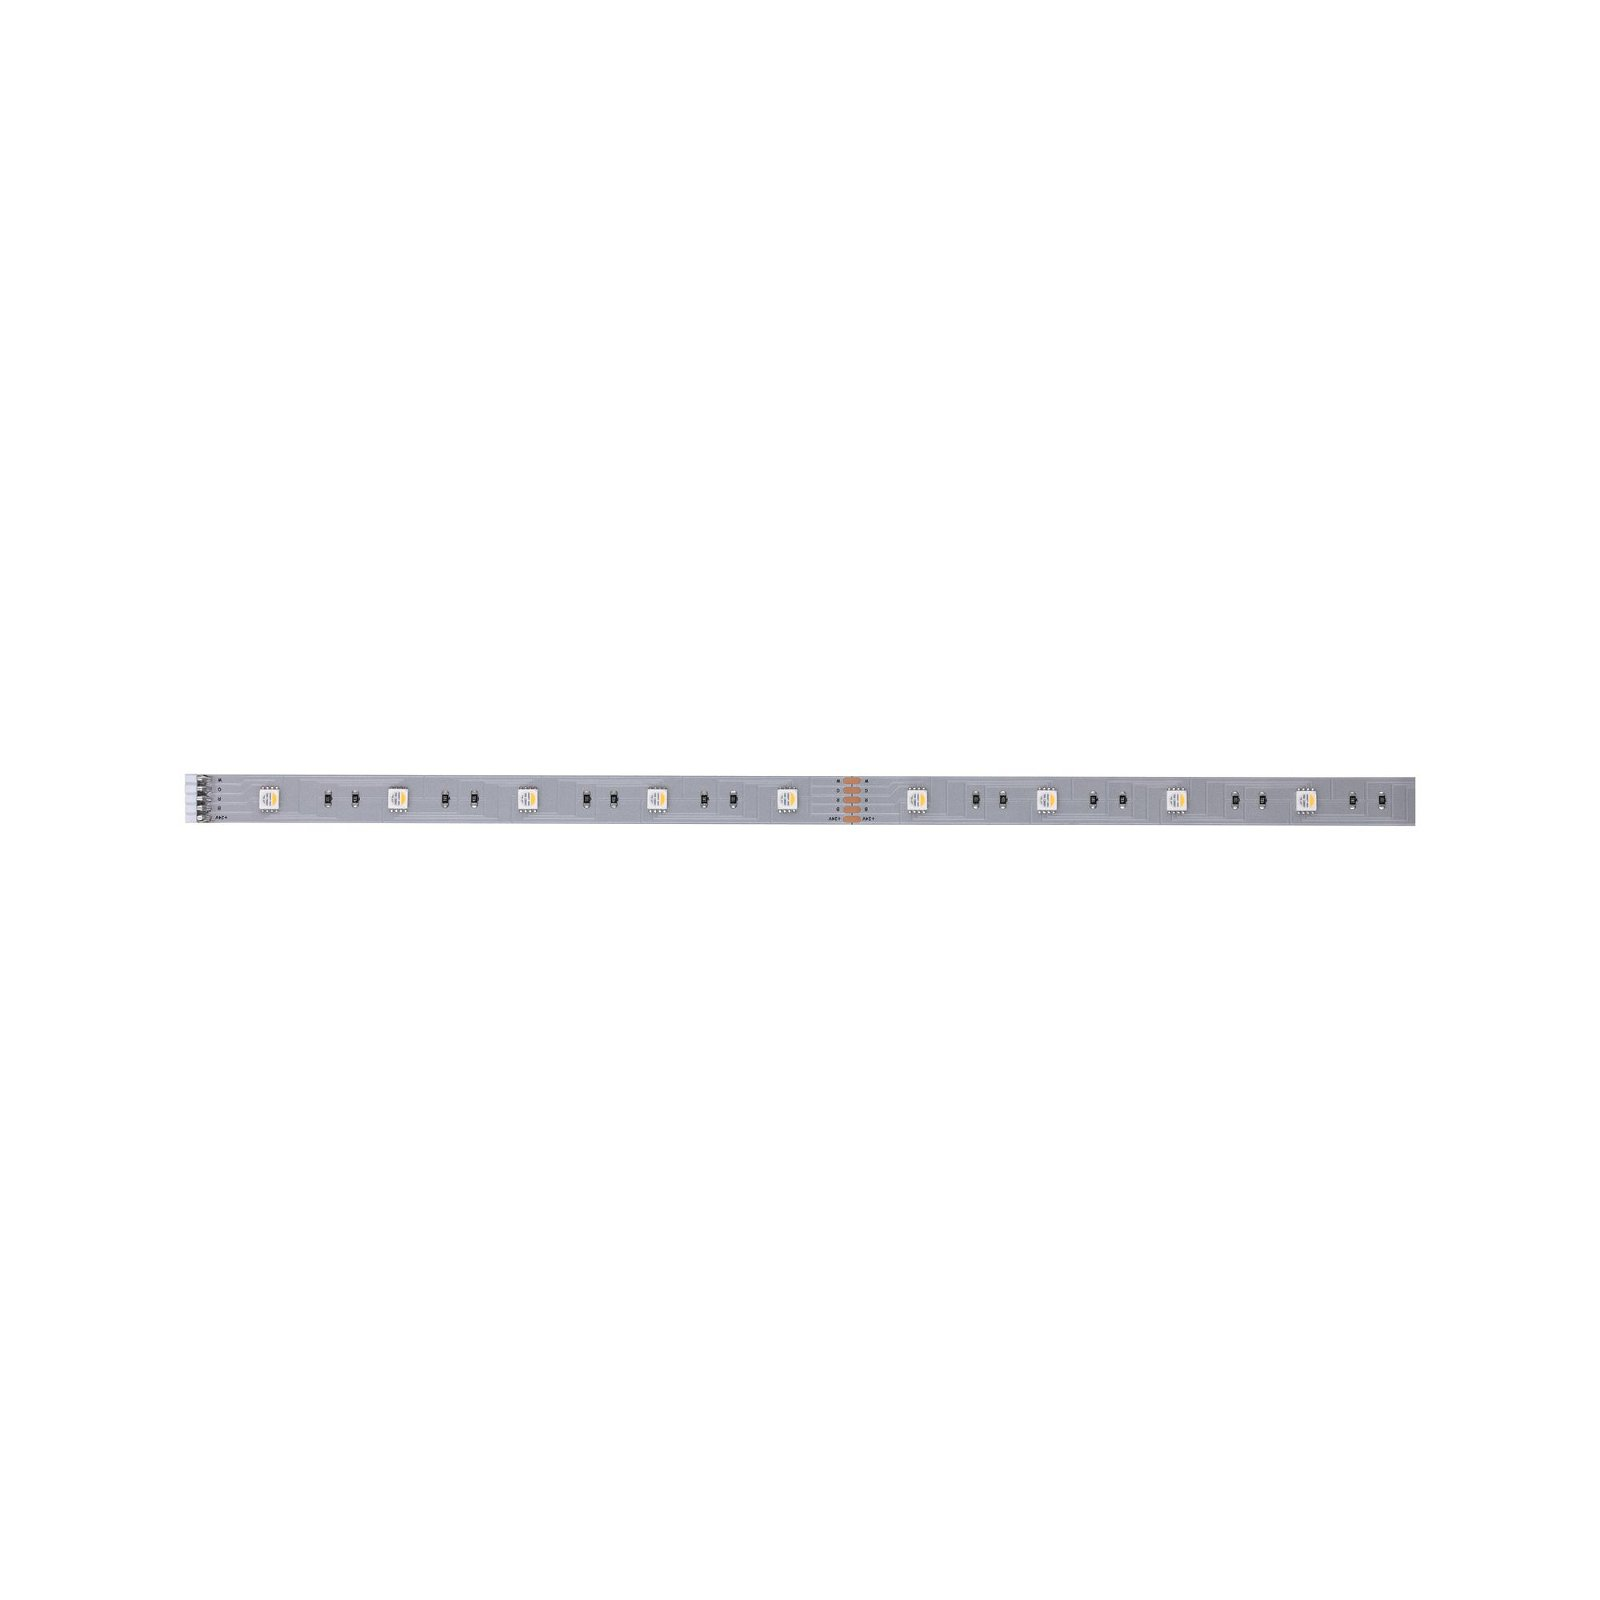 MaxLED 250 LED Strip RGBW 1m 7W 270lm RGBW